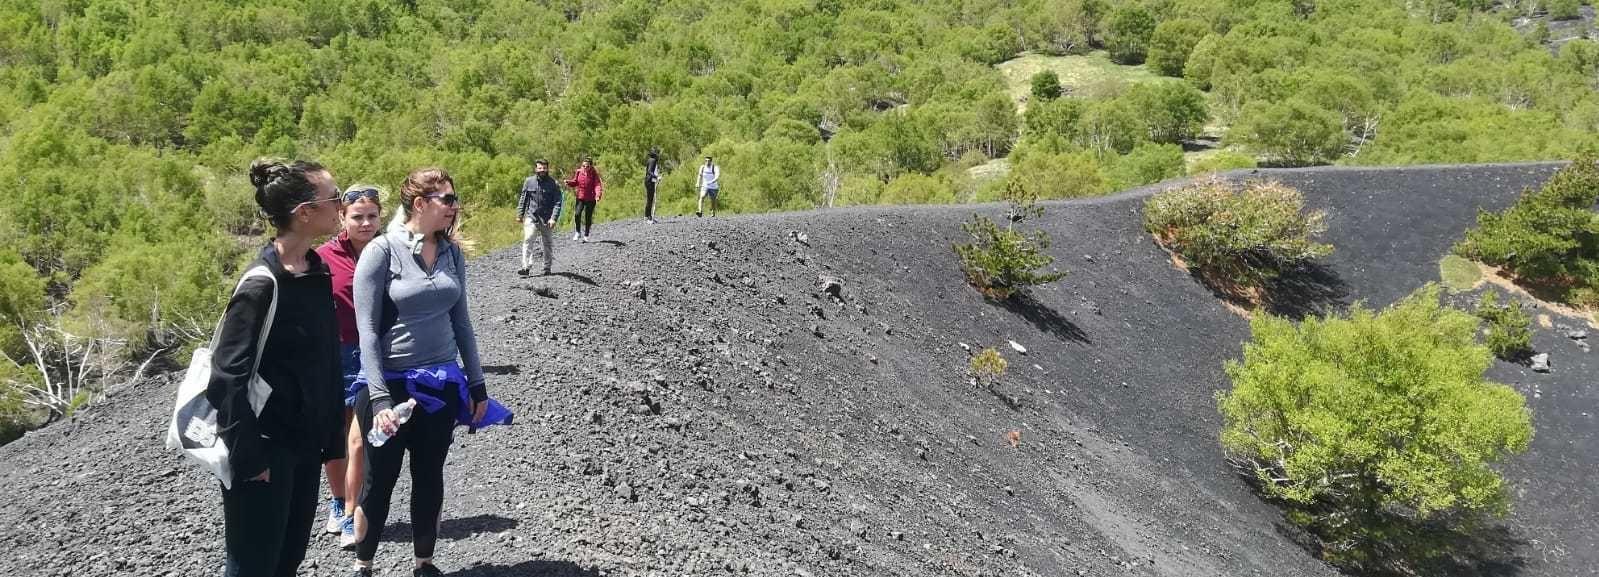 Monte Etna: excursión de medio día desde Taormina